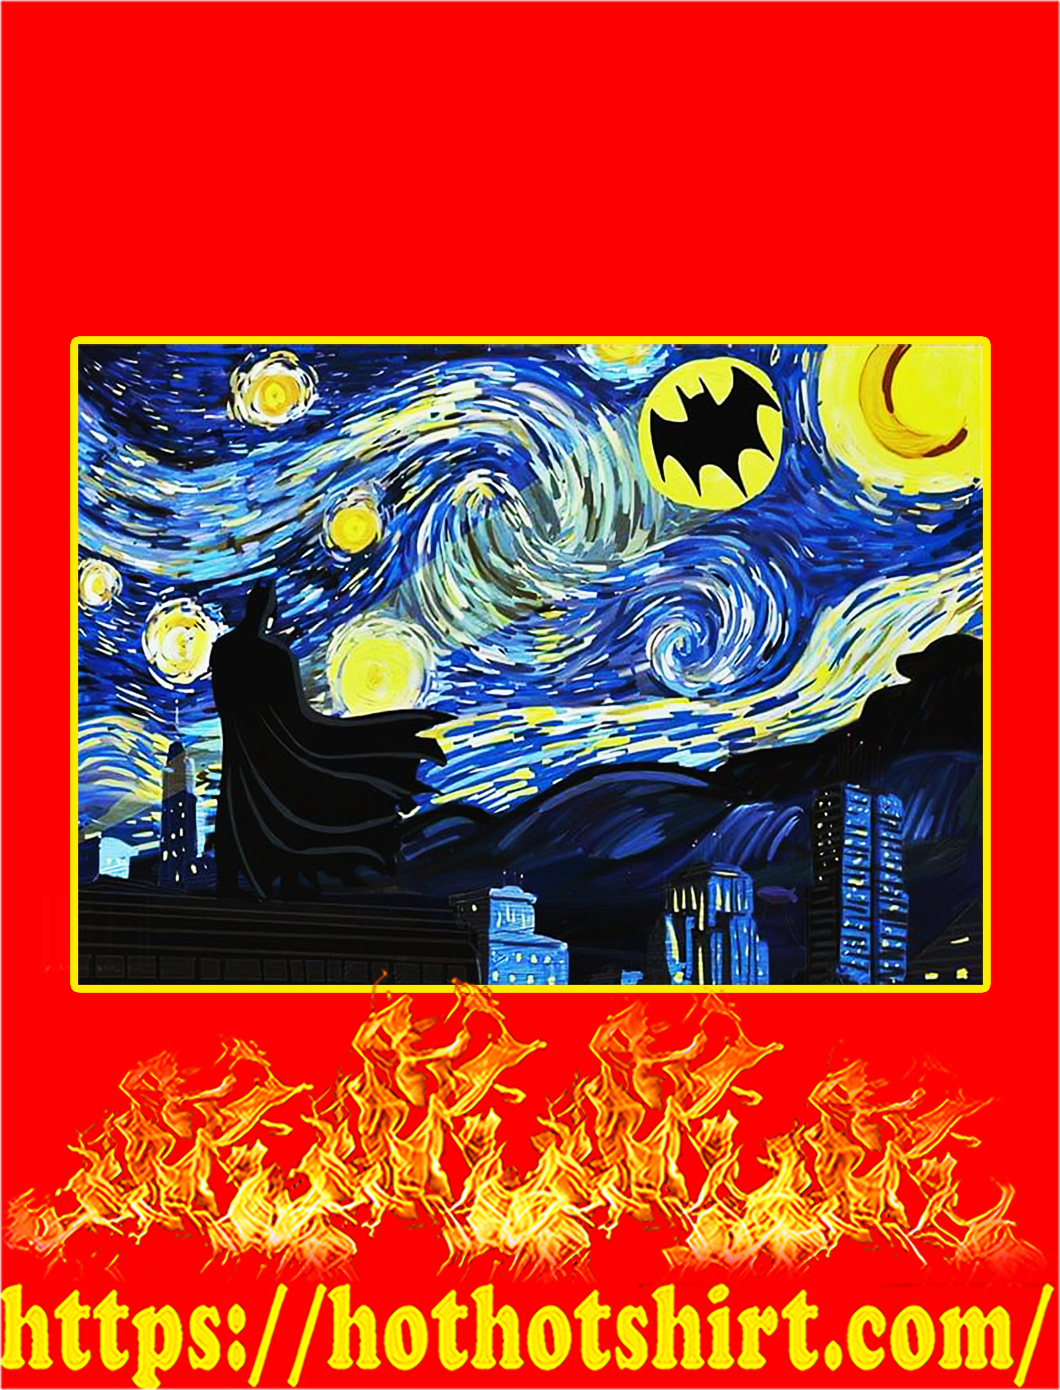 Batman starry night van gogh poster - A3